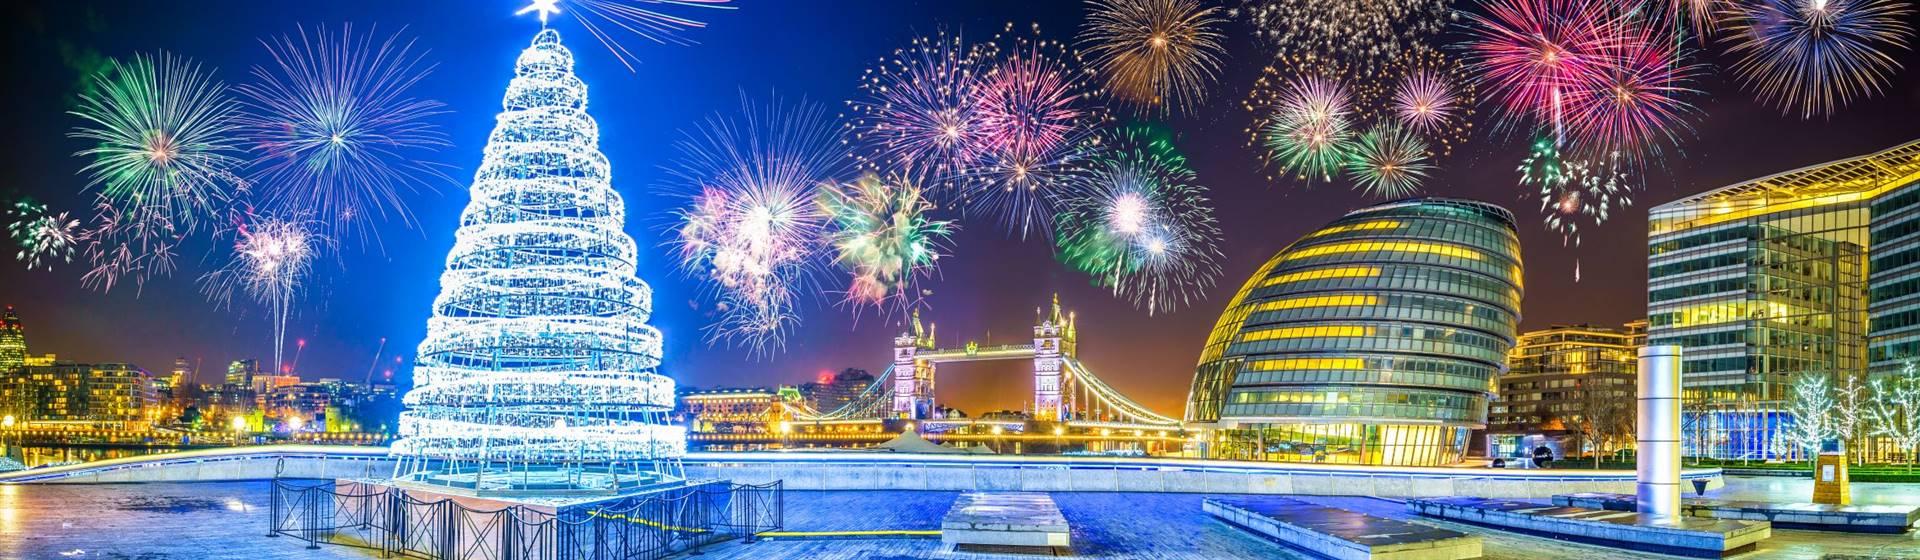 "<img src=""londonchristmasshutterstock.jpeg"" alt=""London Festive""/>"